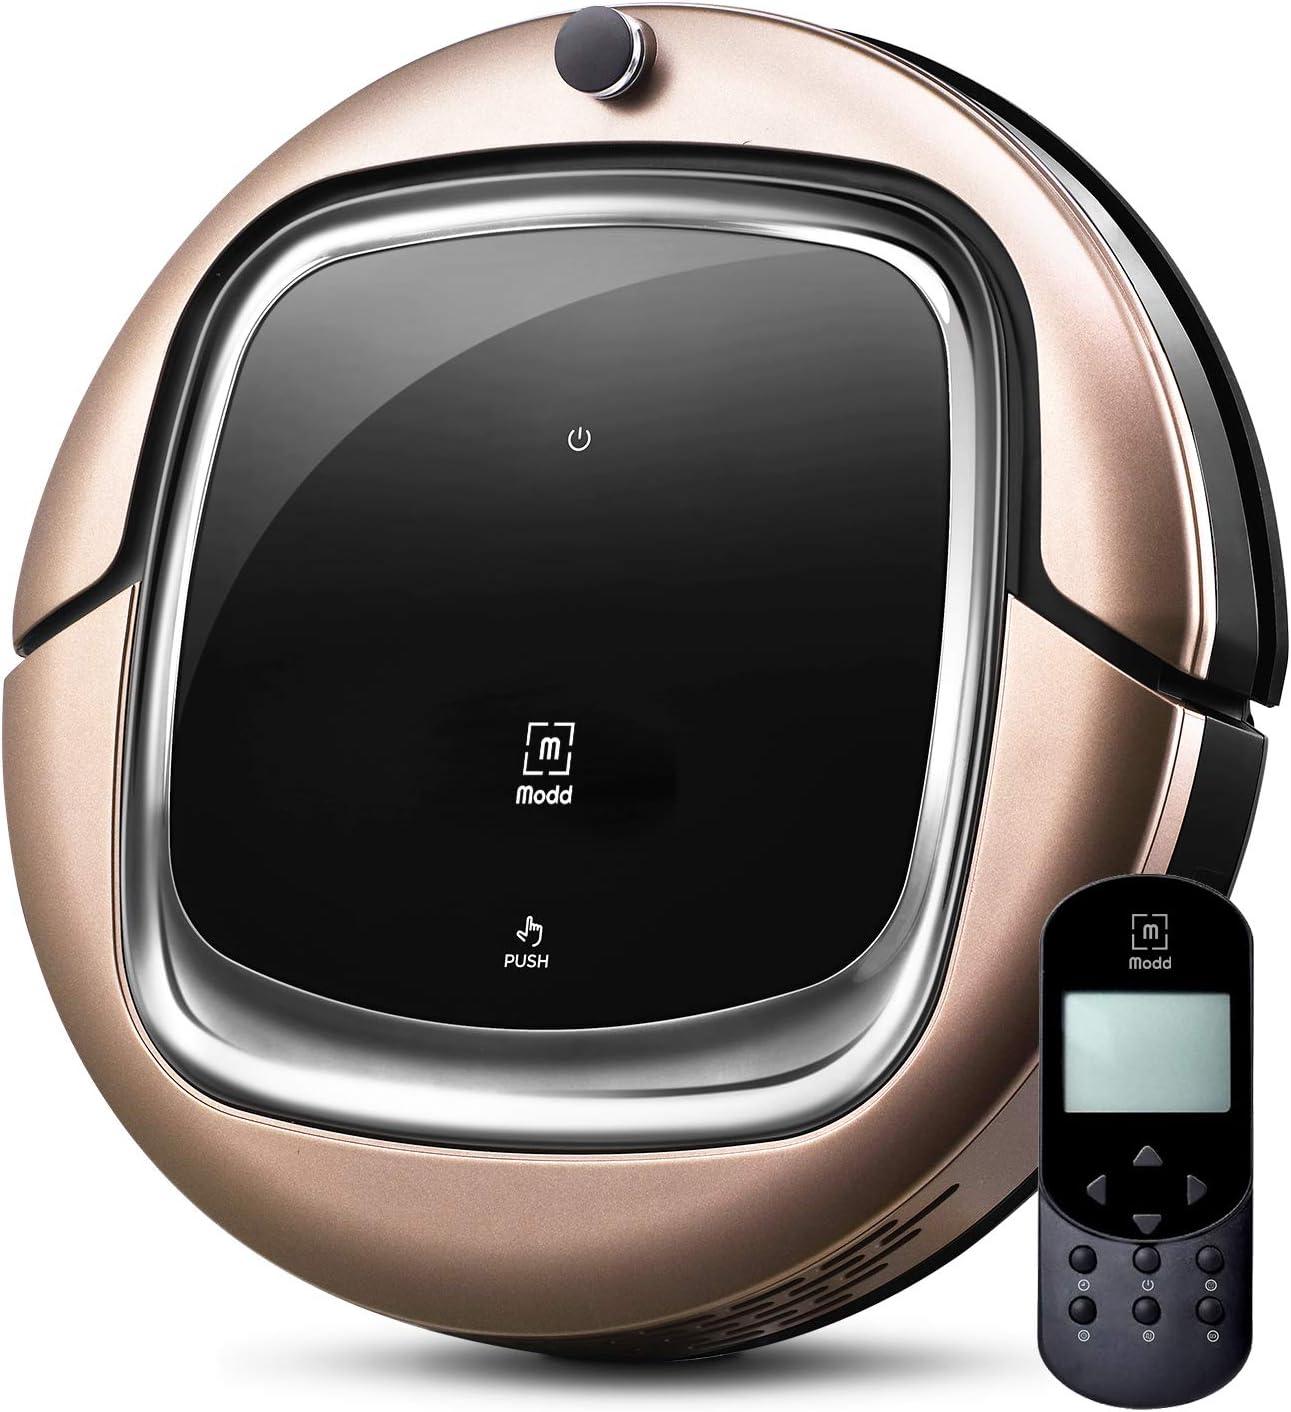 Modd i360Move Robot Vacuum Cleaner